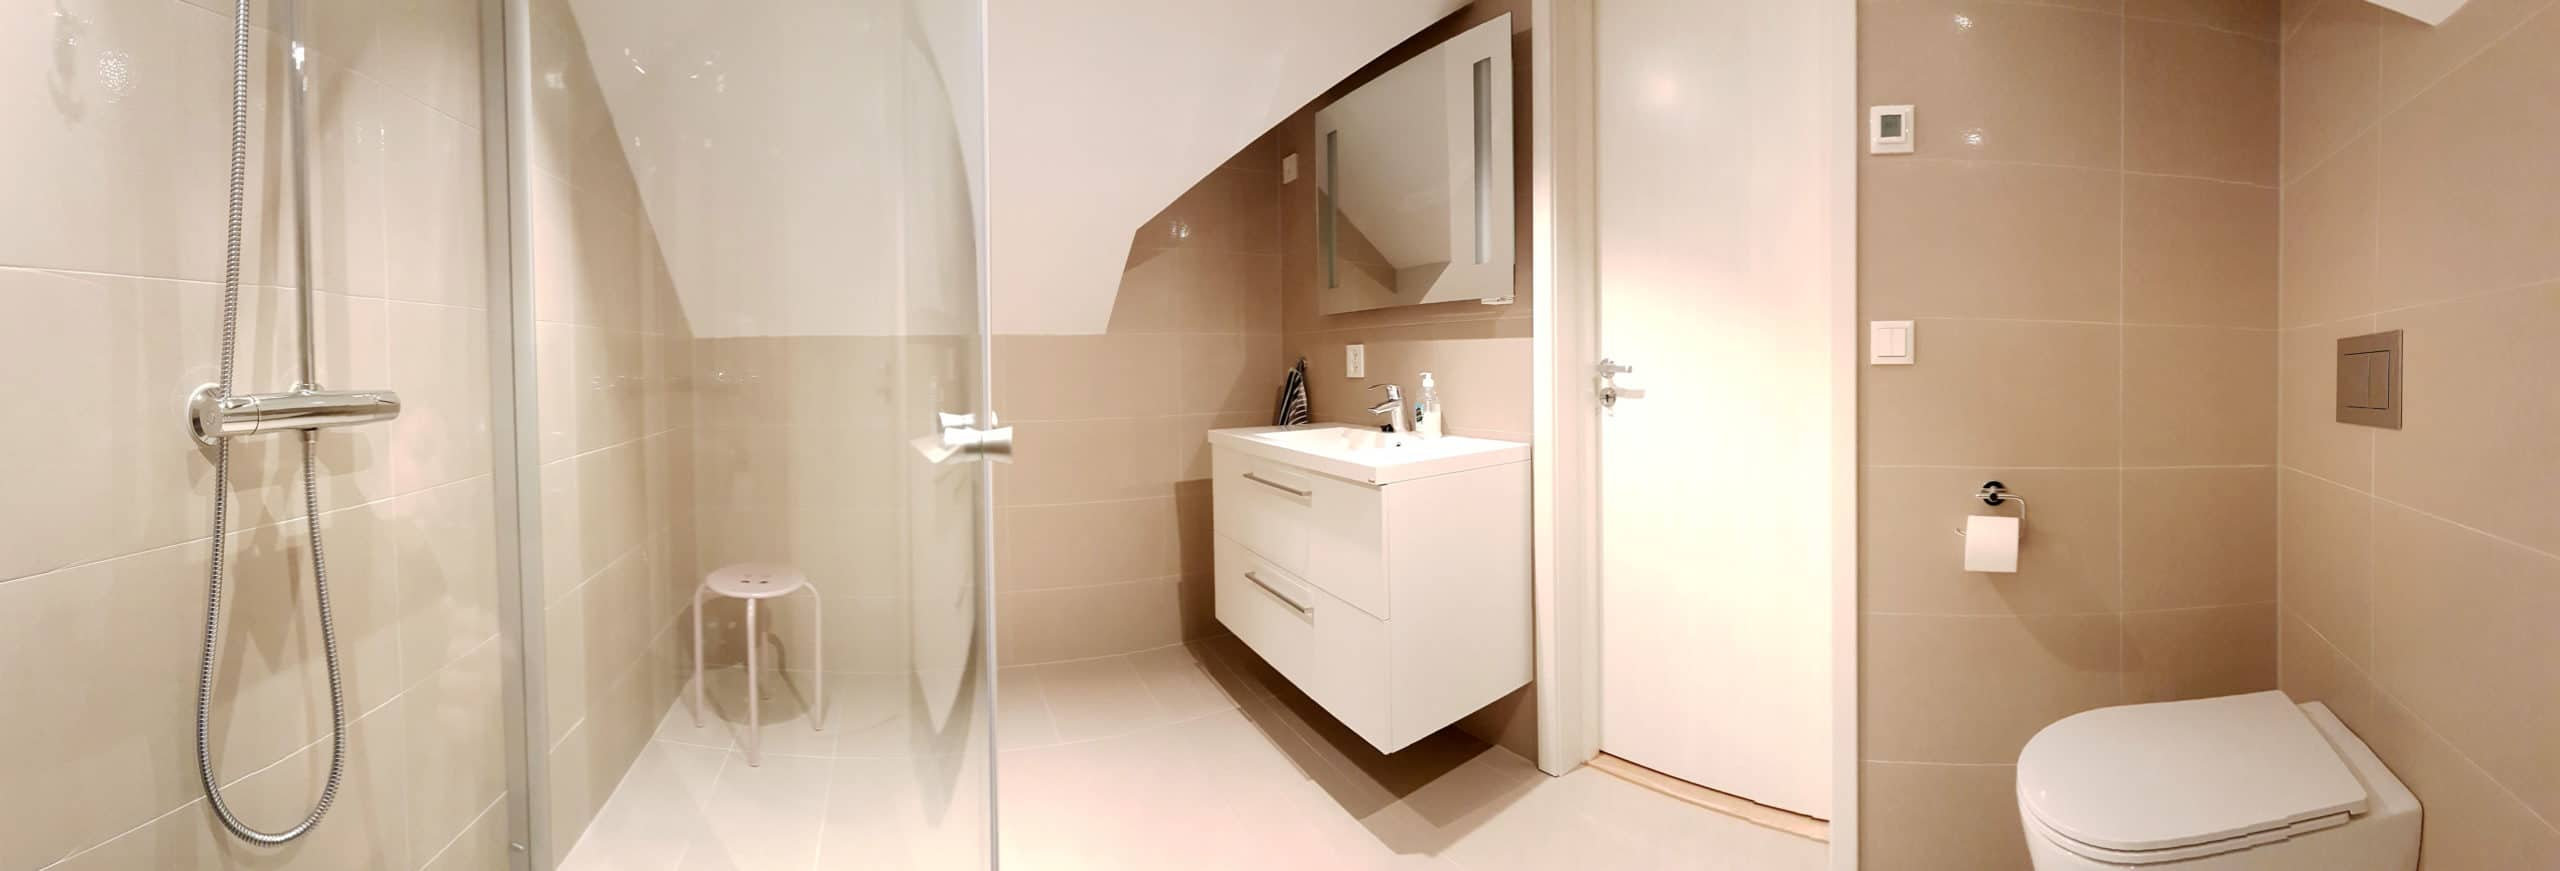 SanSelcabin Bathroom 2nd floor